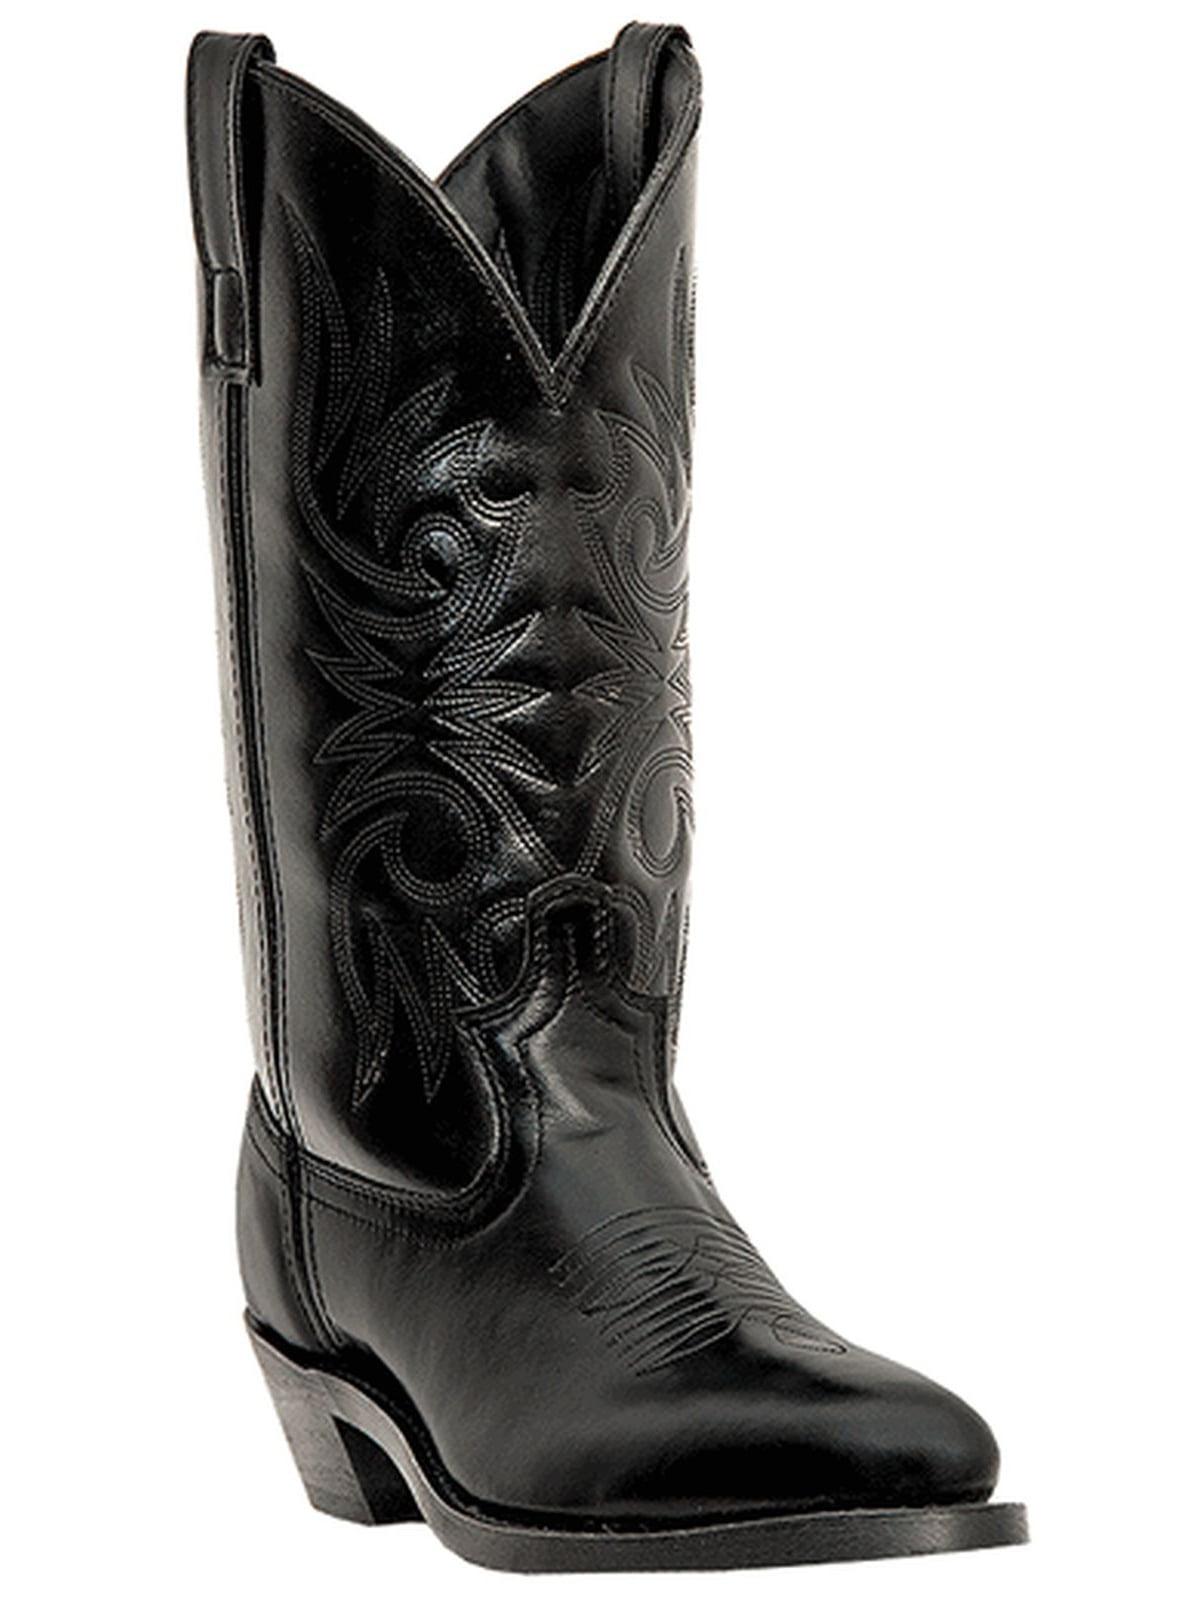 Laredo 4240 Men's Black Paris Western Boots by Laredo